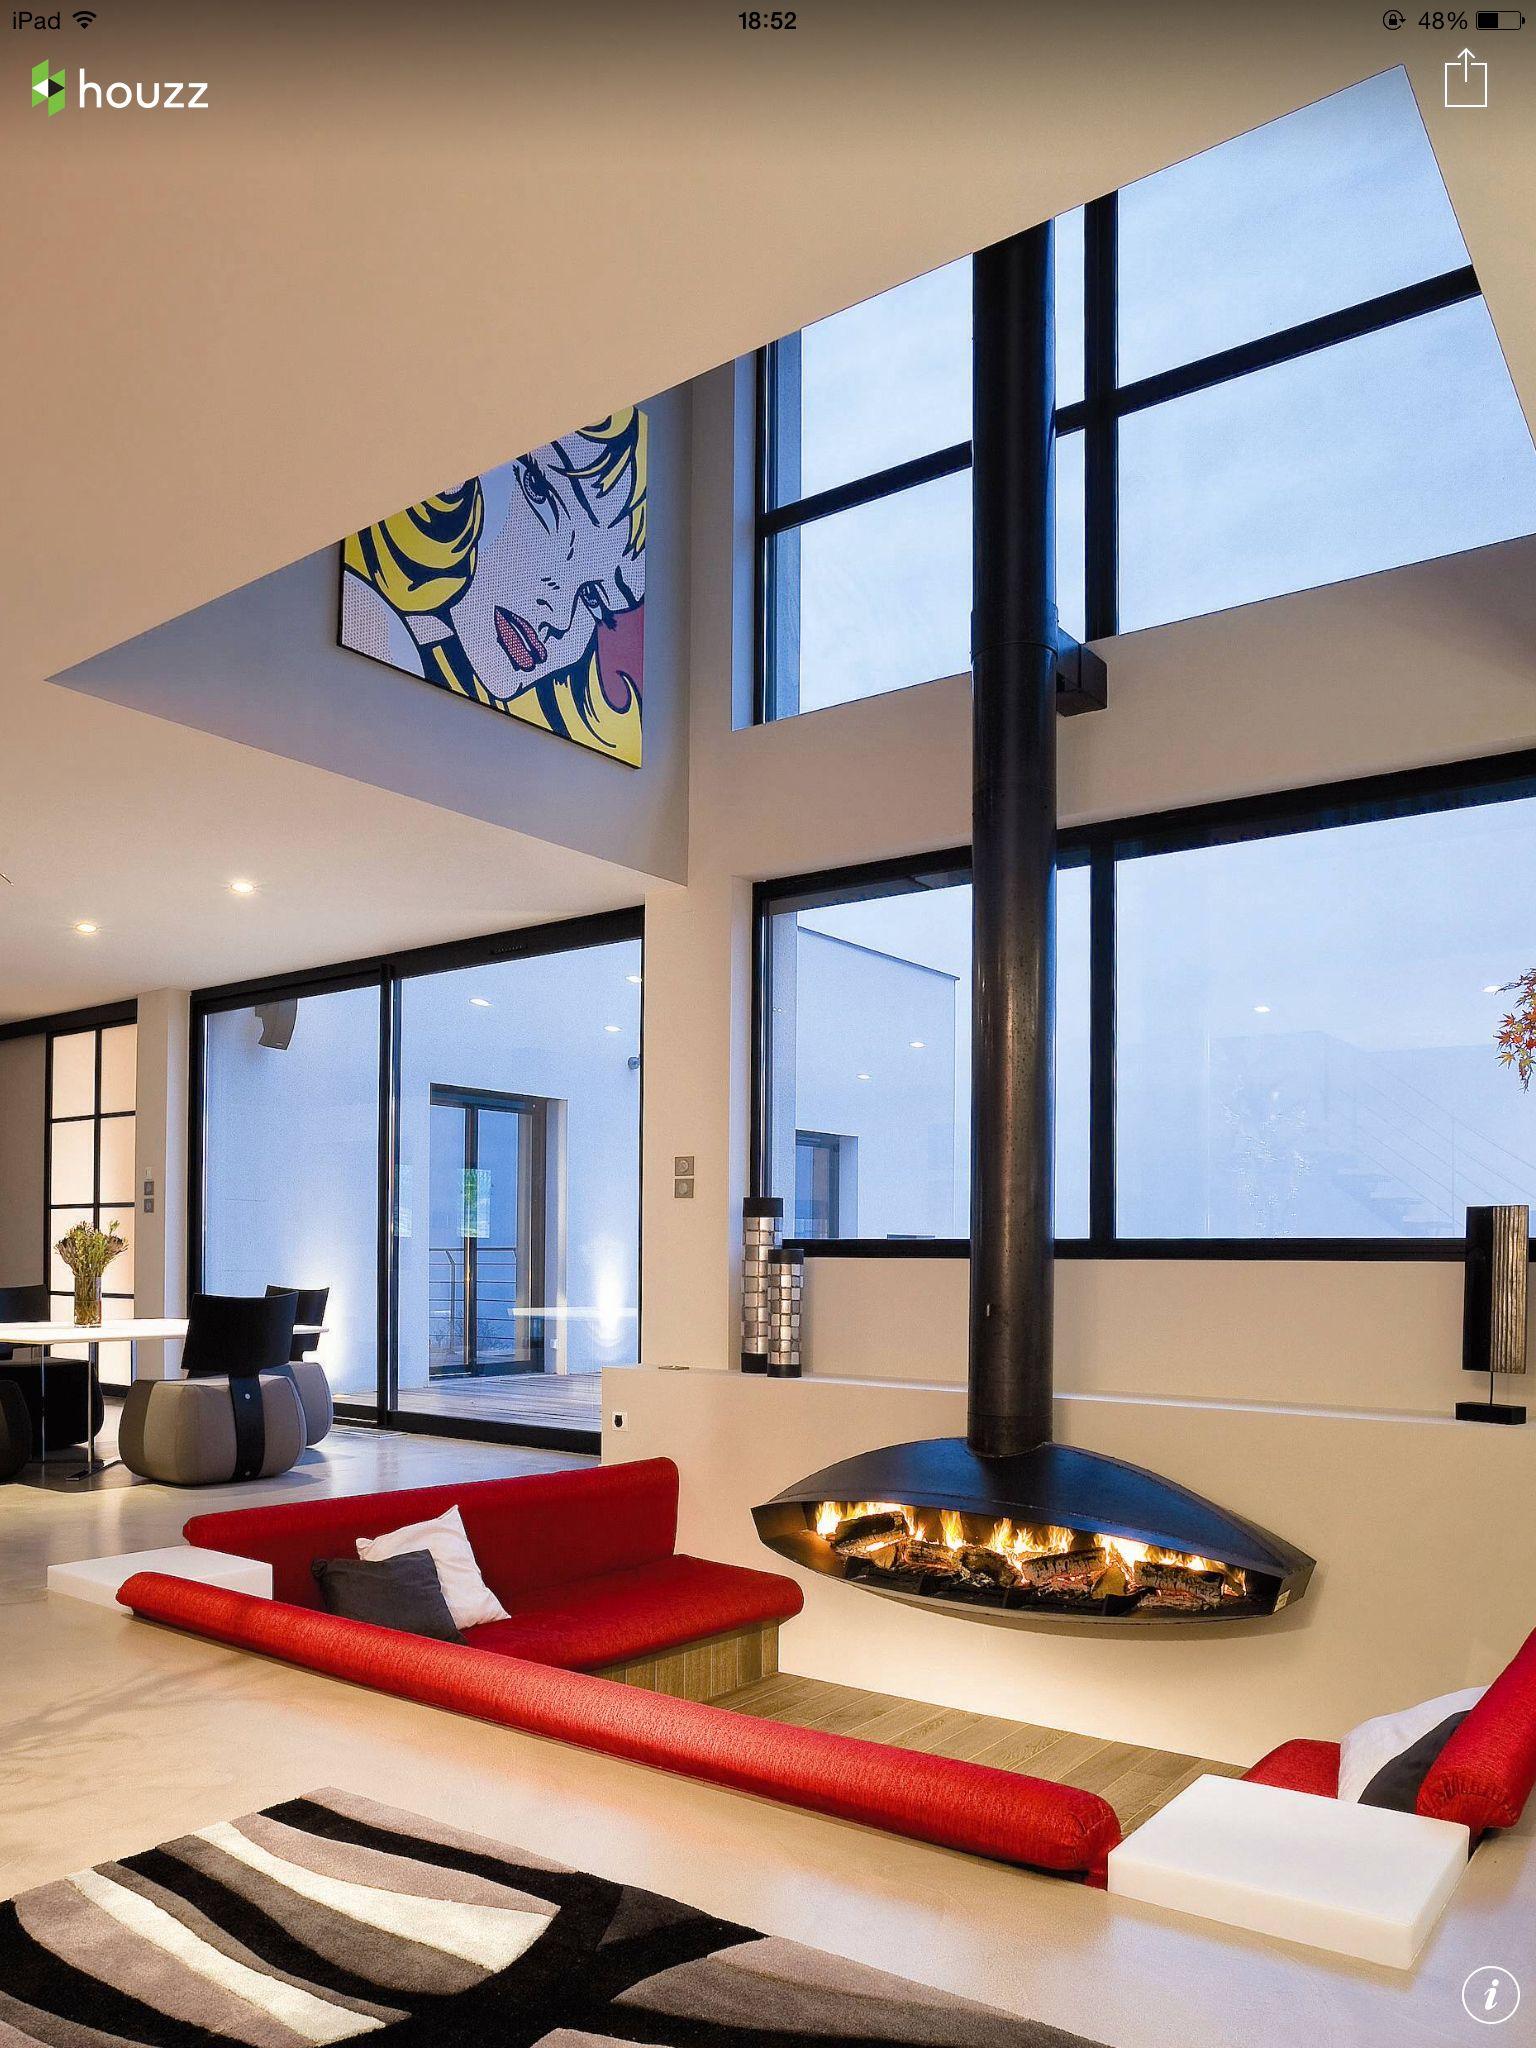 Home treppen design-ideen pin by mariam martirosyan on home decor  pinterest